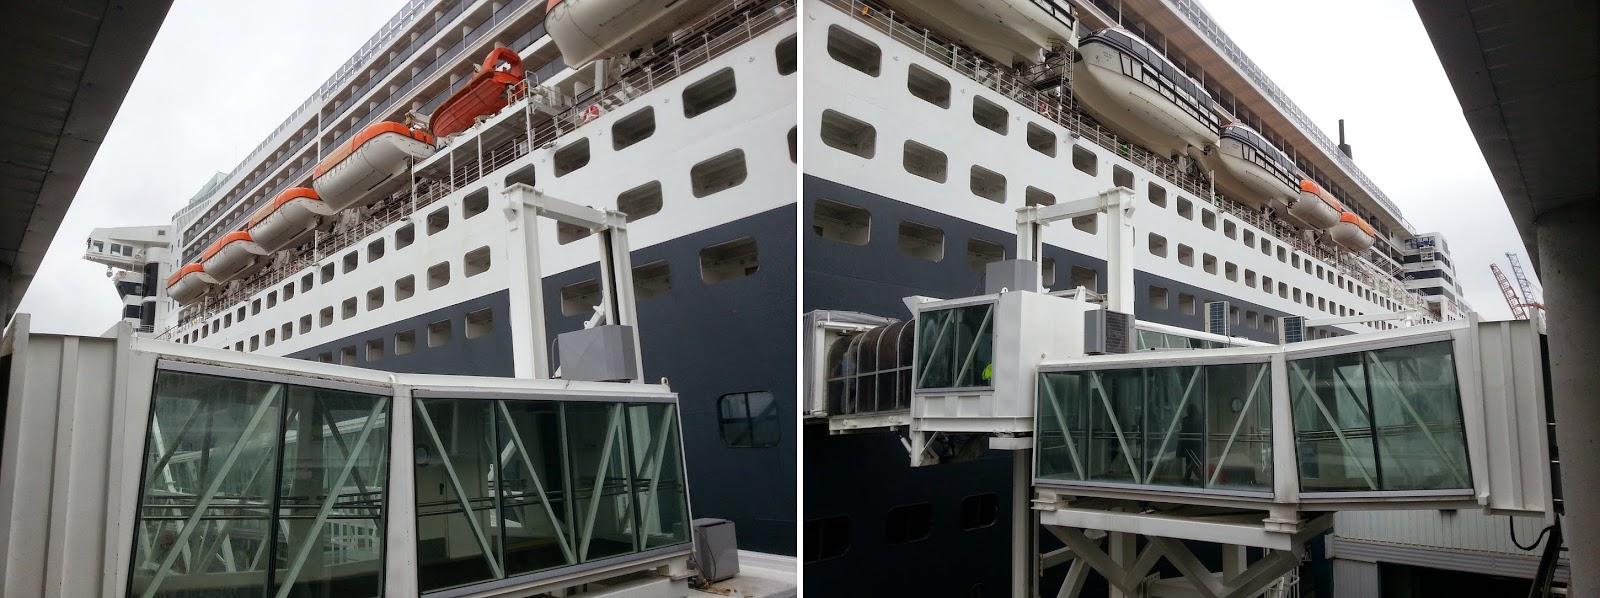 Queen Mary 2 (QM2) alongside at Brooklyn Cruise Terminal, New York